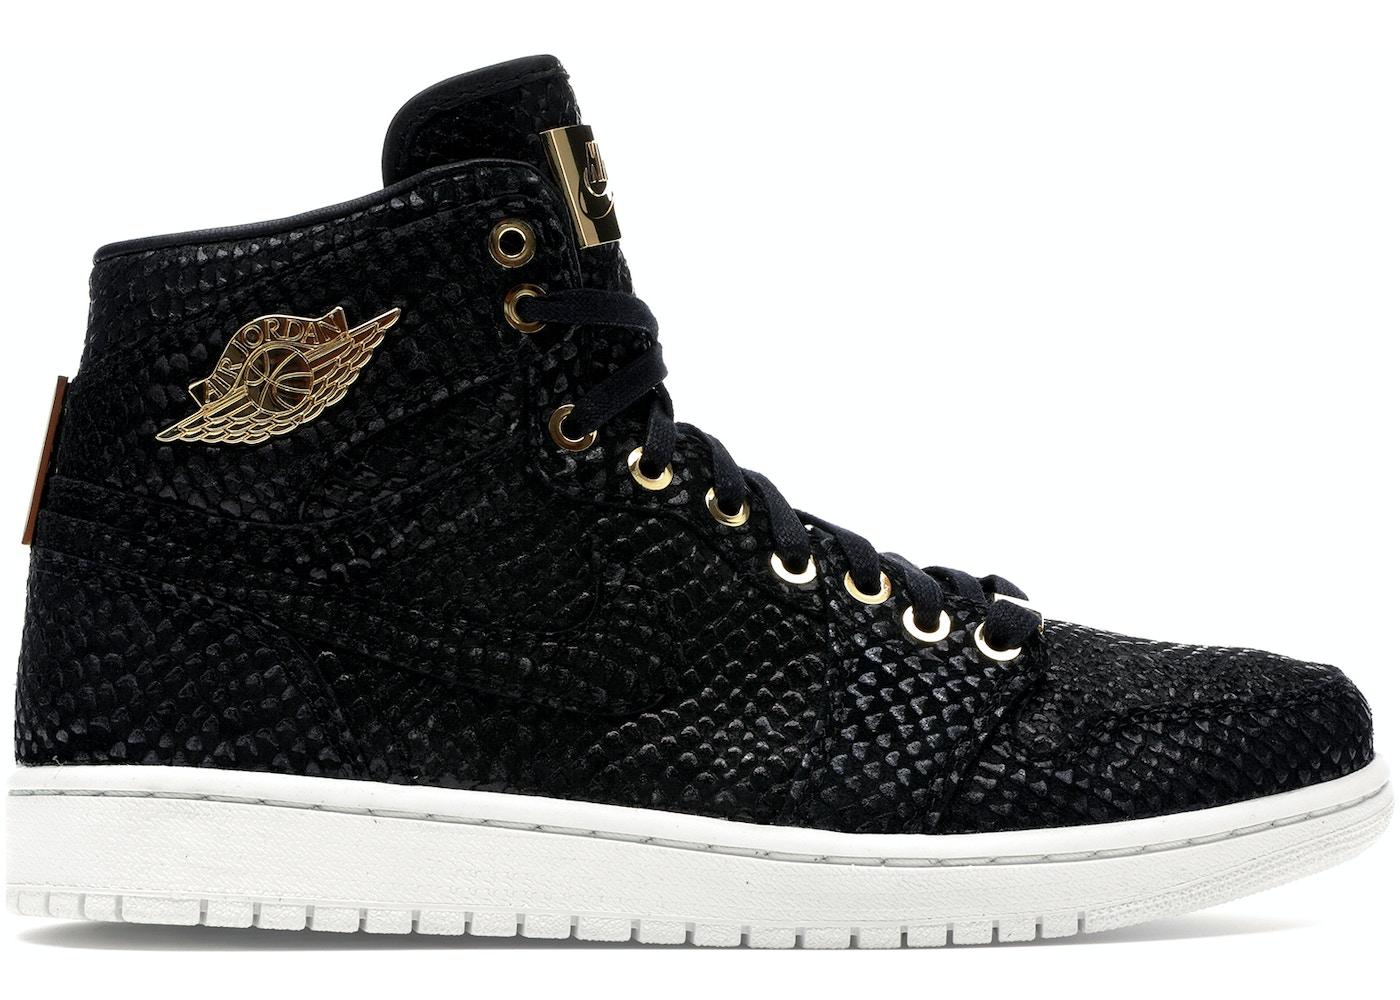 sports shoes c329e 6d8a8 Jordan 1 Retro Pinnacle Black - 705075-030